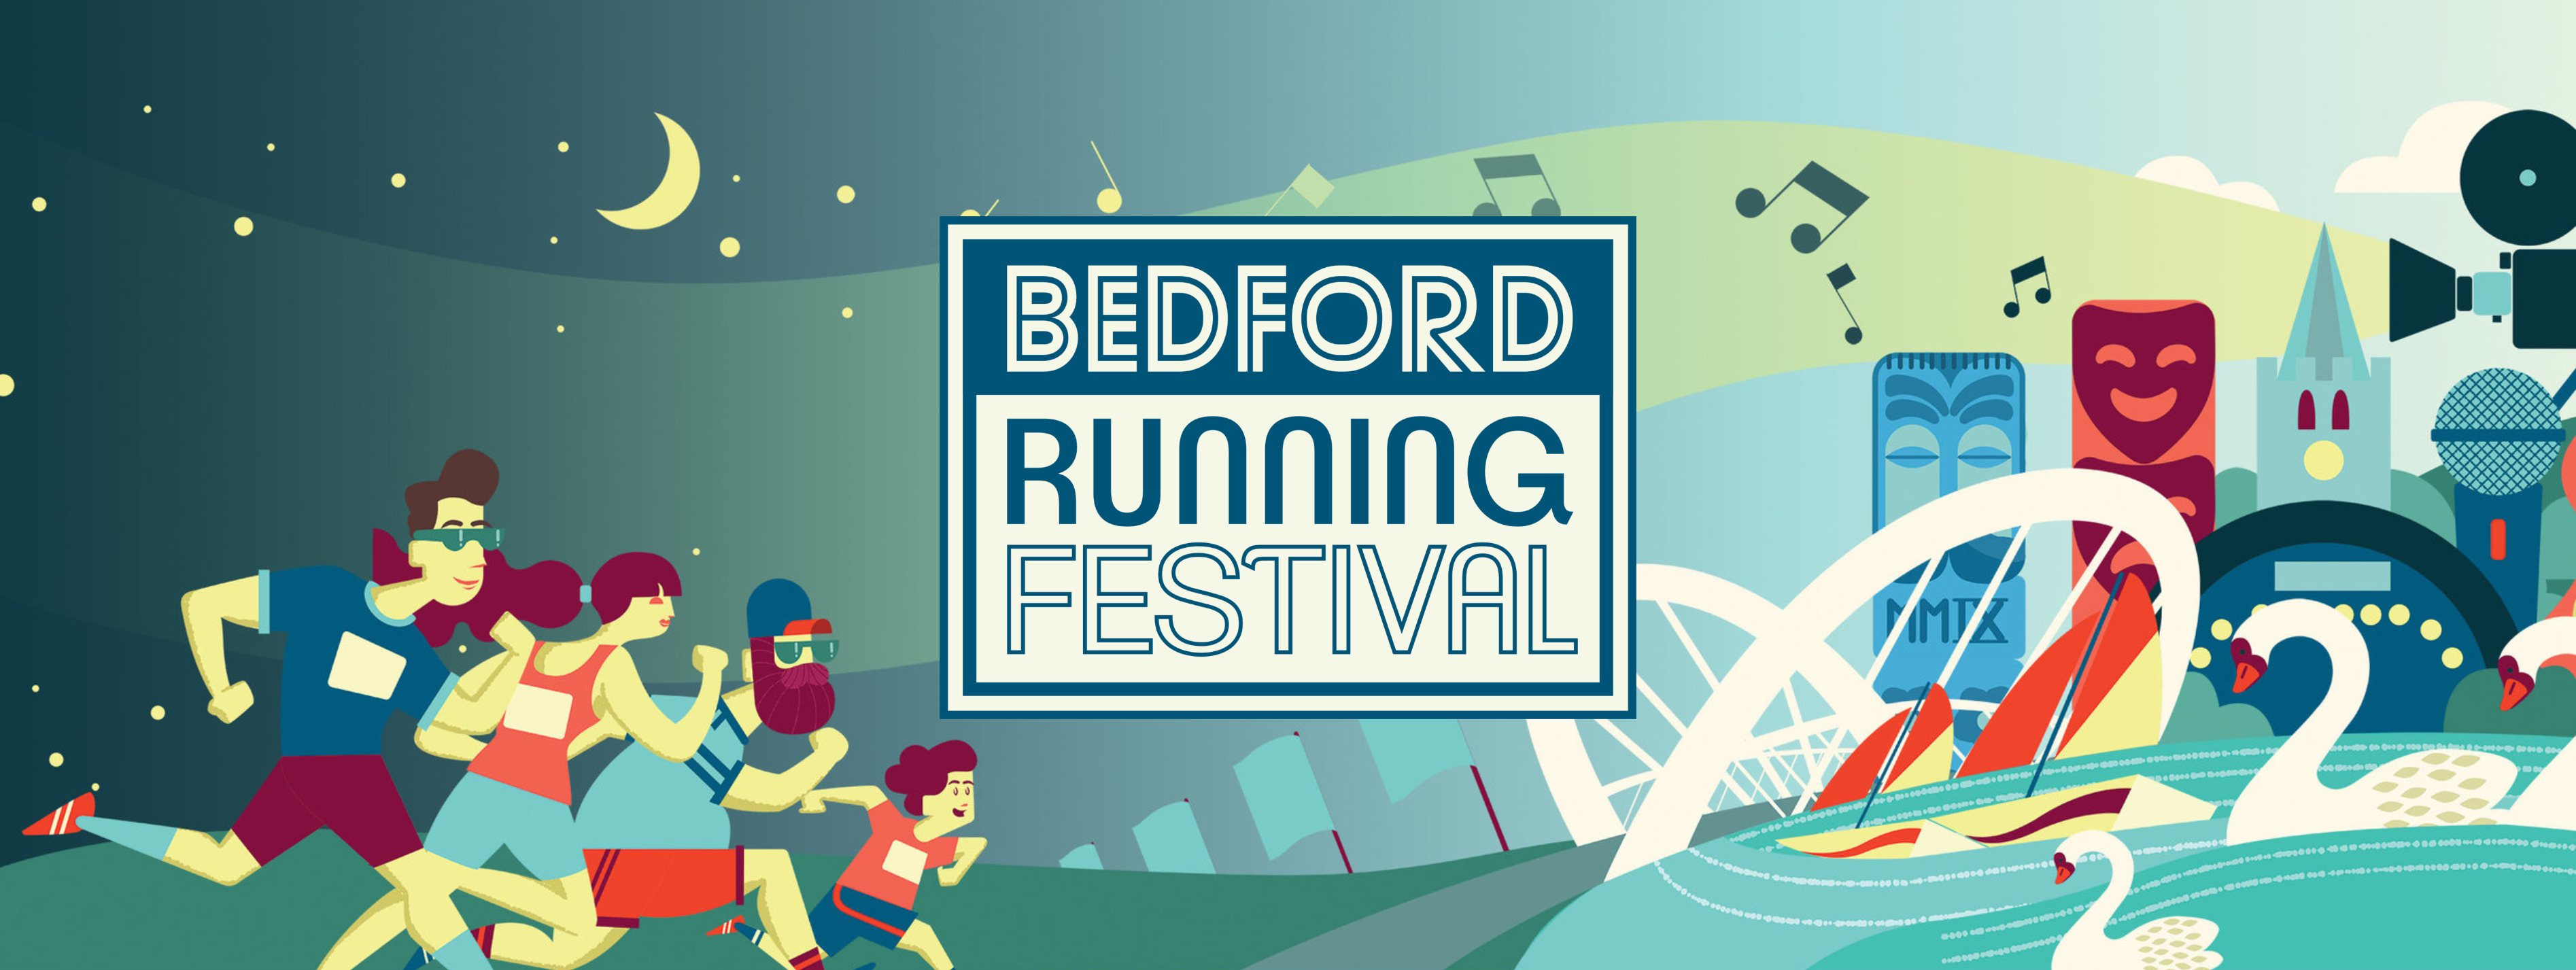 Bedford Running Festival - cover image